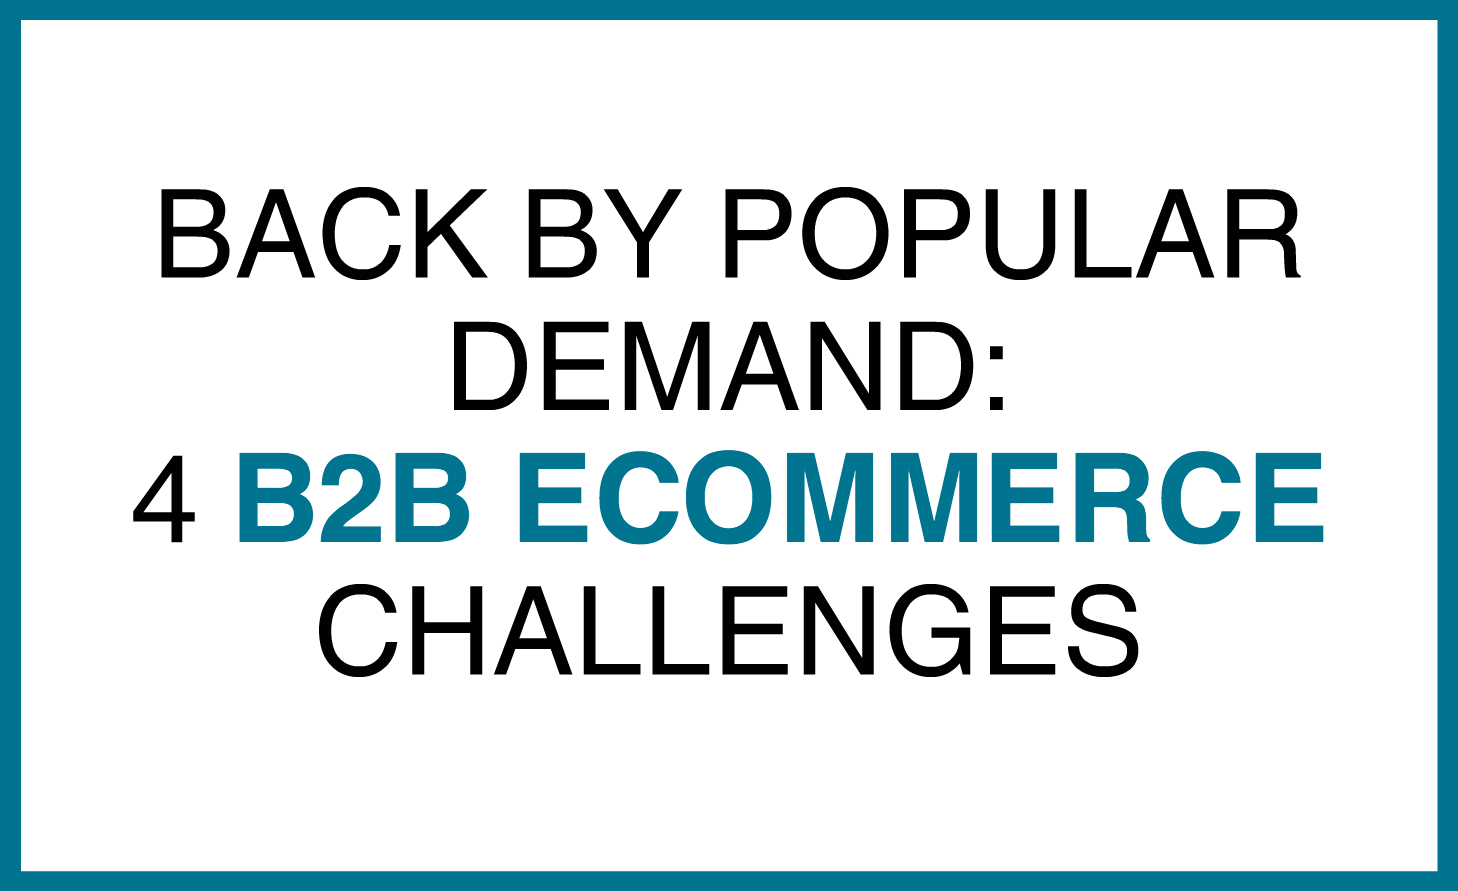 4 B2B eCommerce challenges.png